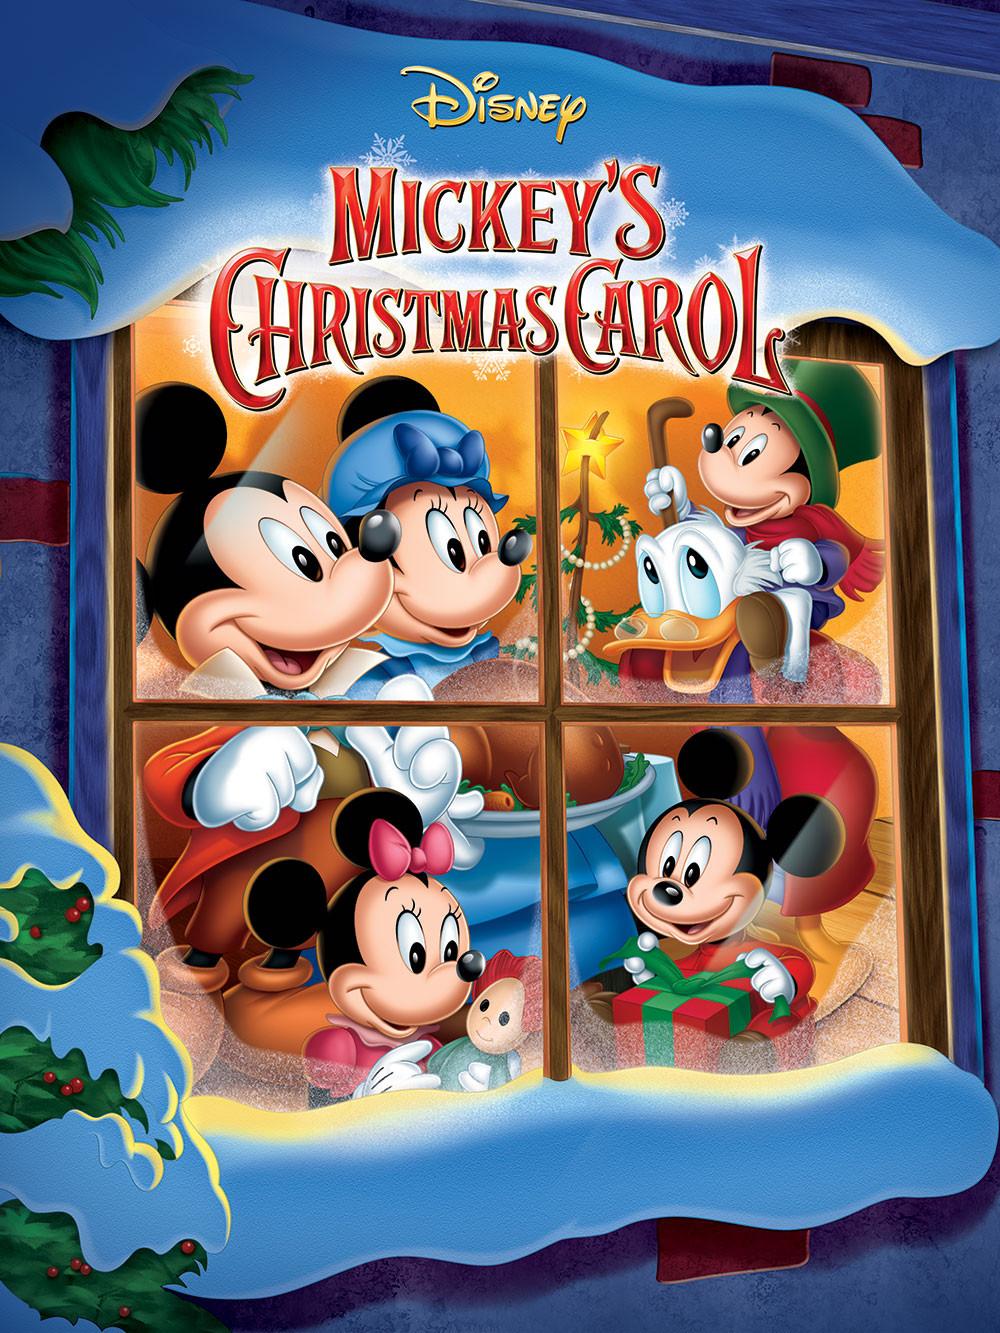 mickey's christmas carol streaming, mickey christmas carol age group, christmas carol mickey mouse, disney's christmas carol